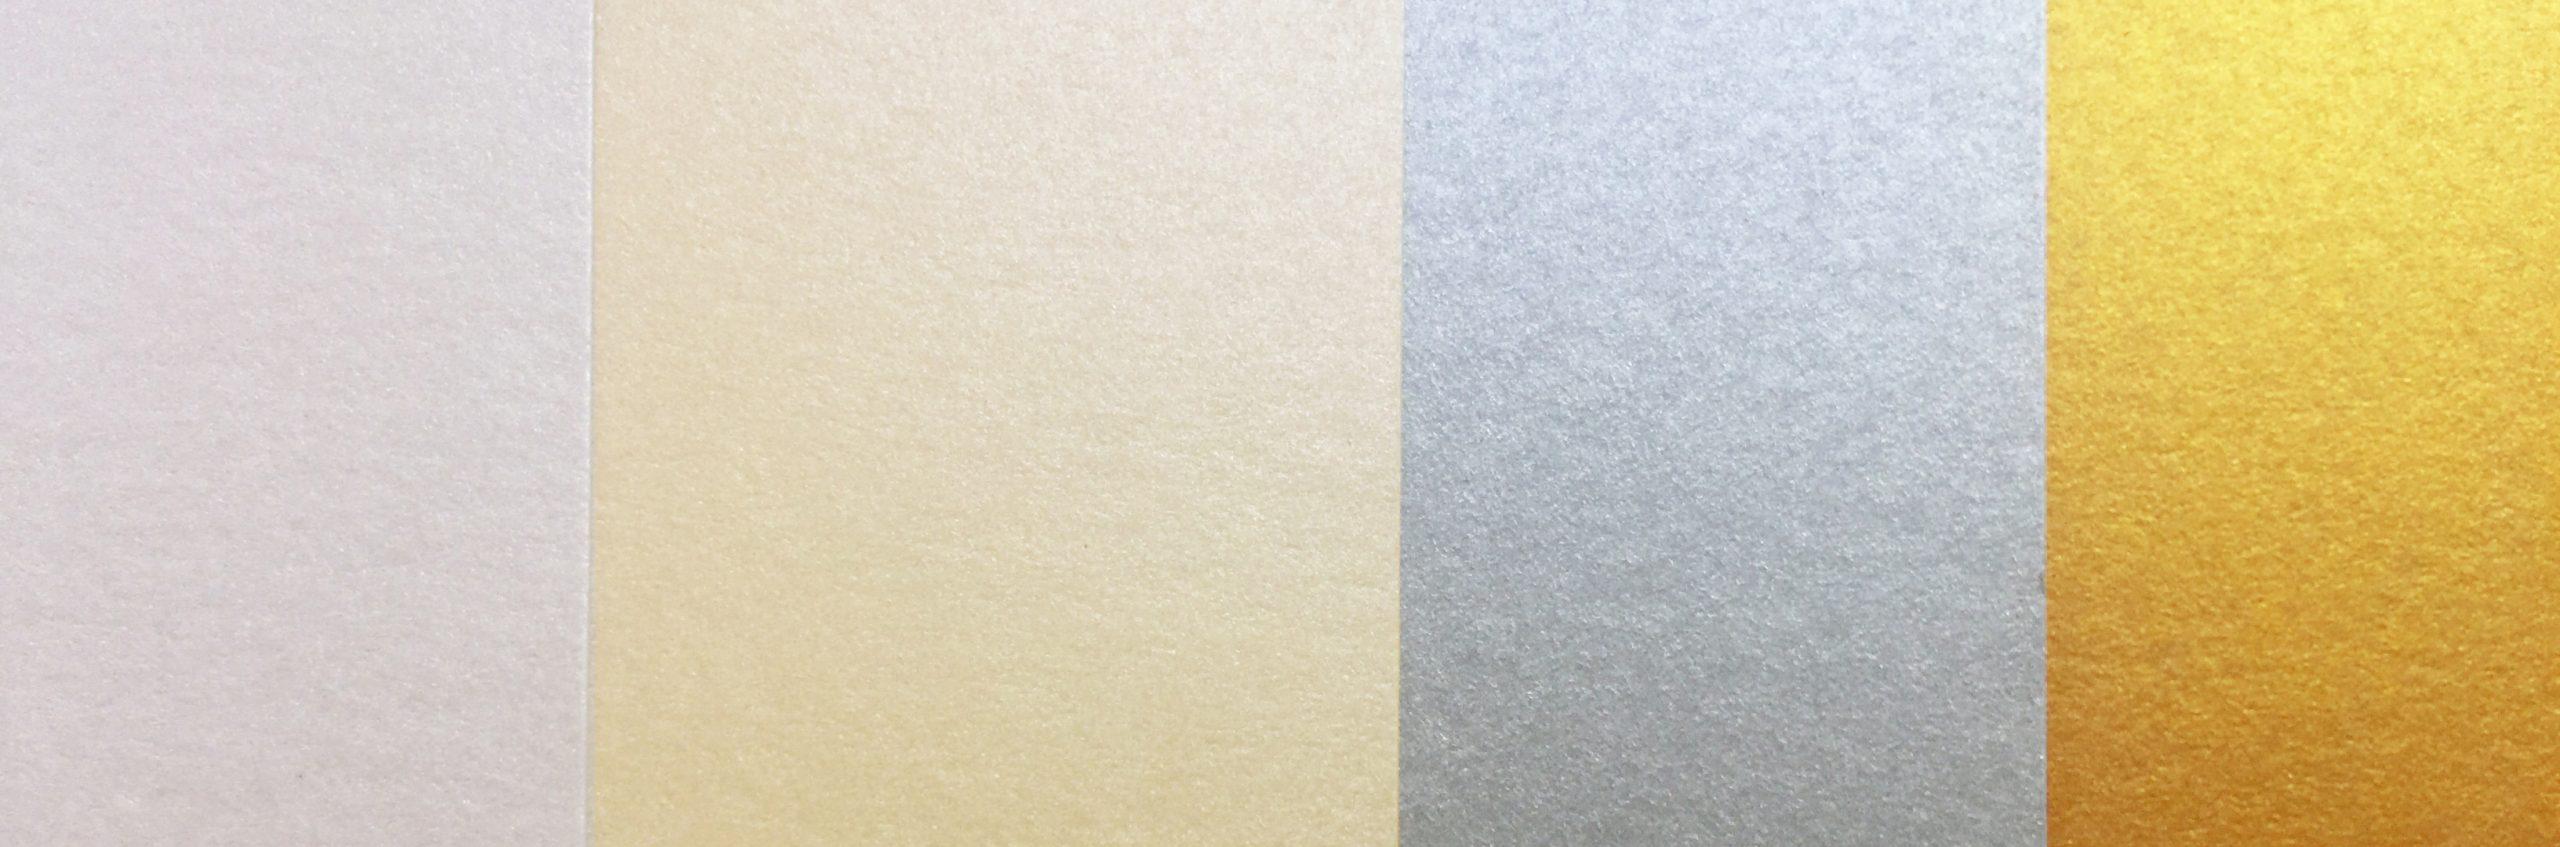 metallic paper samples - 4 colours